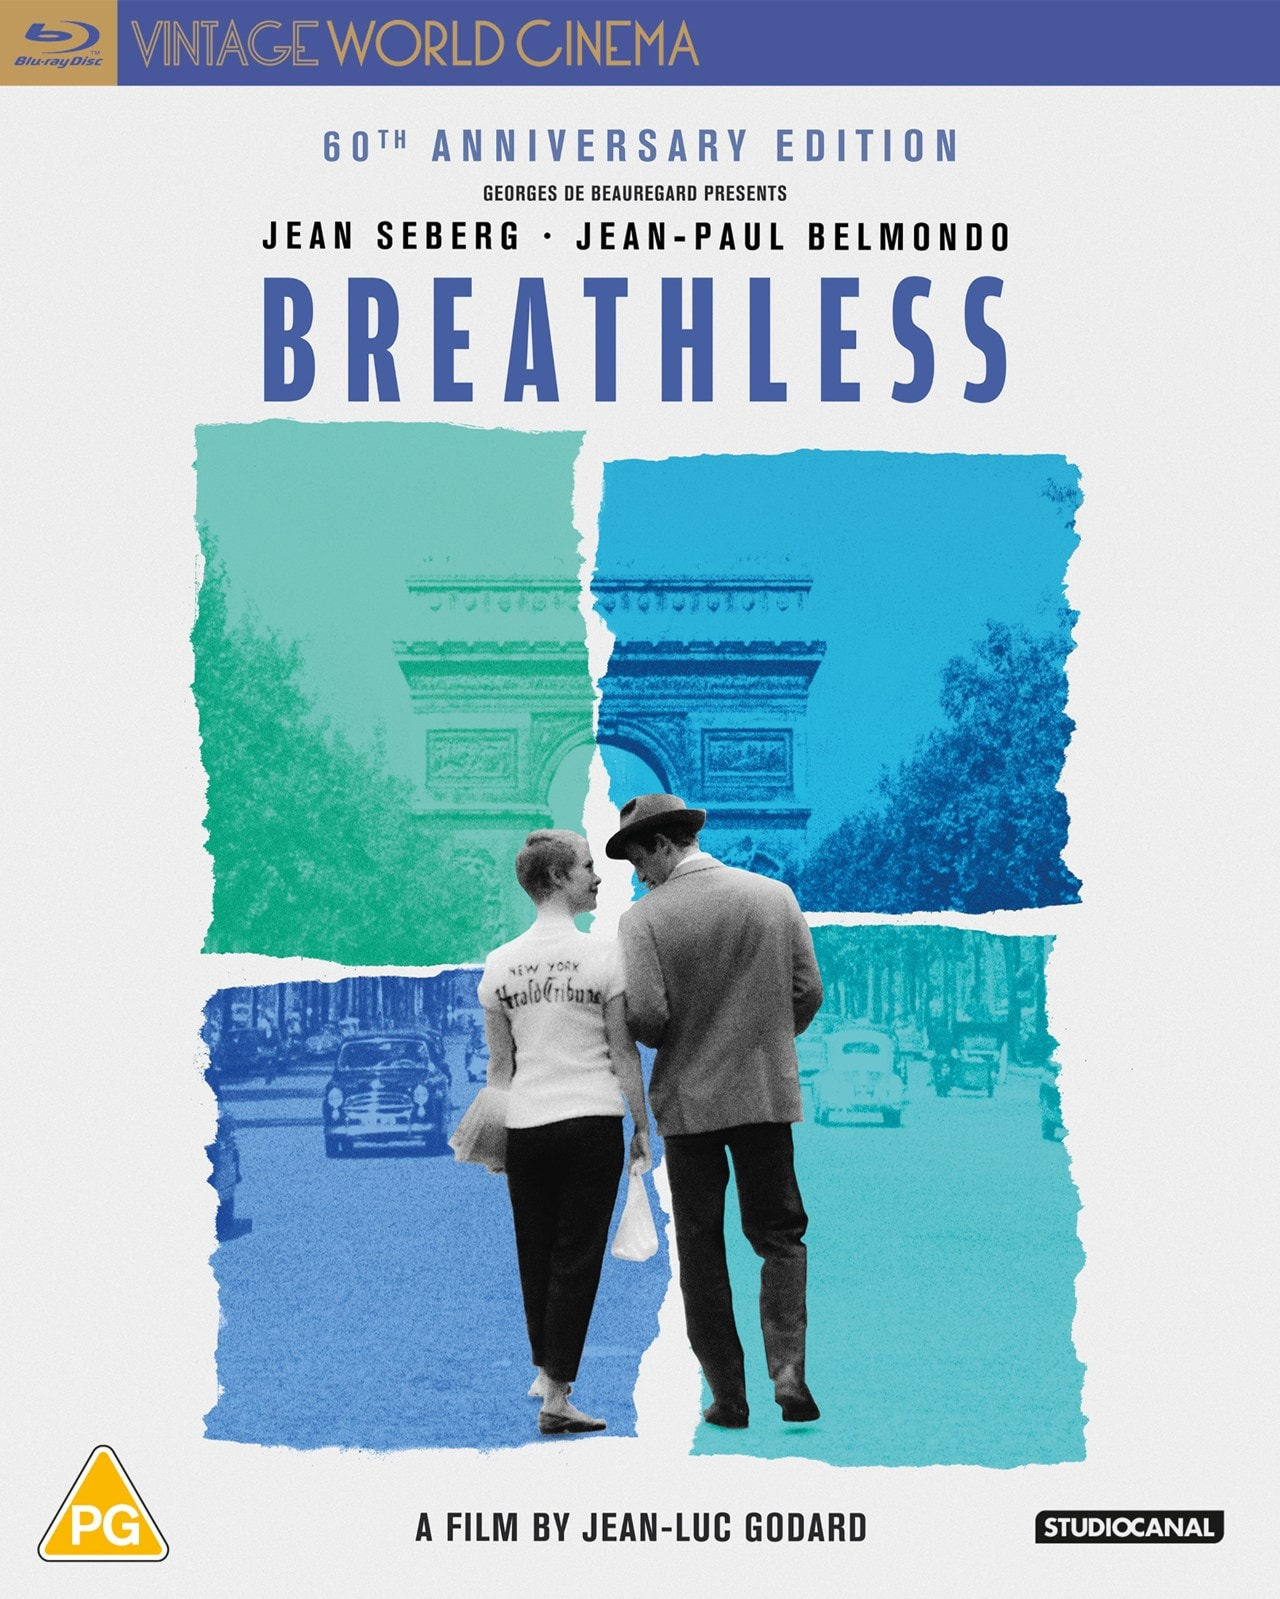 Breathless   Blu-ray   Free shipping over £20   HMV Store